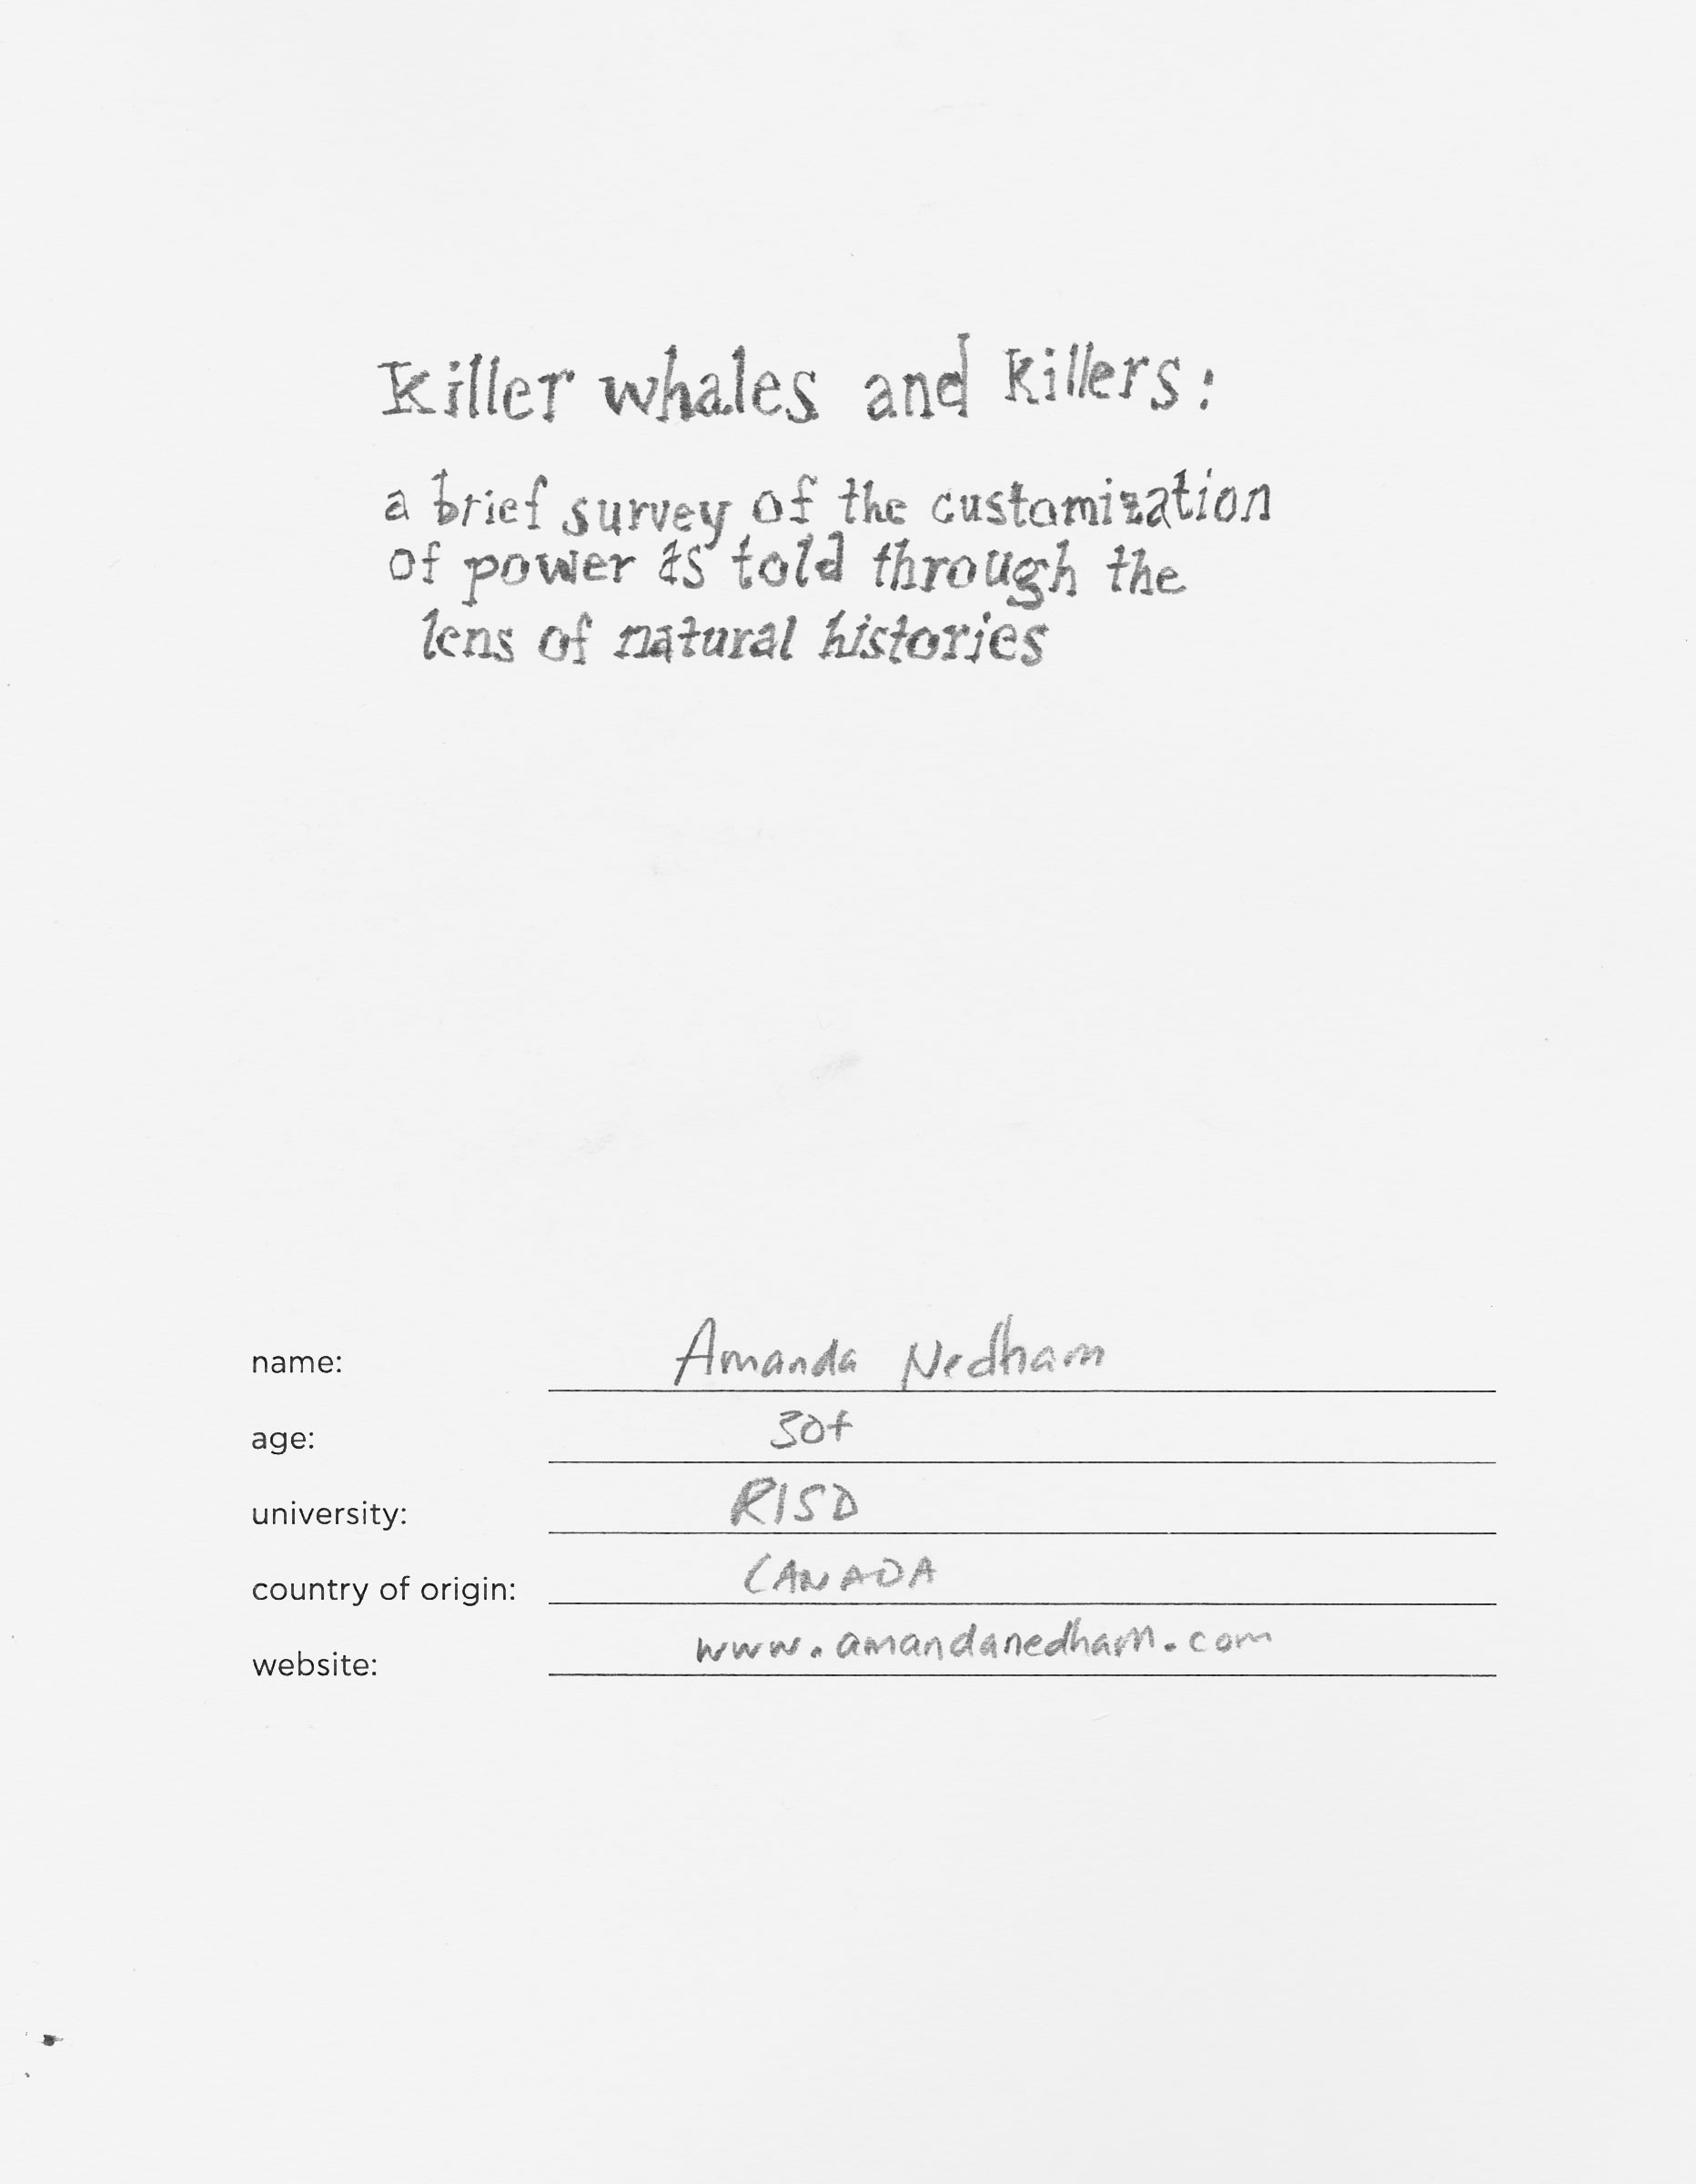 Killers & Killer Whales